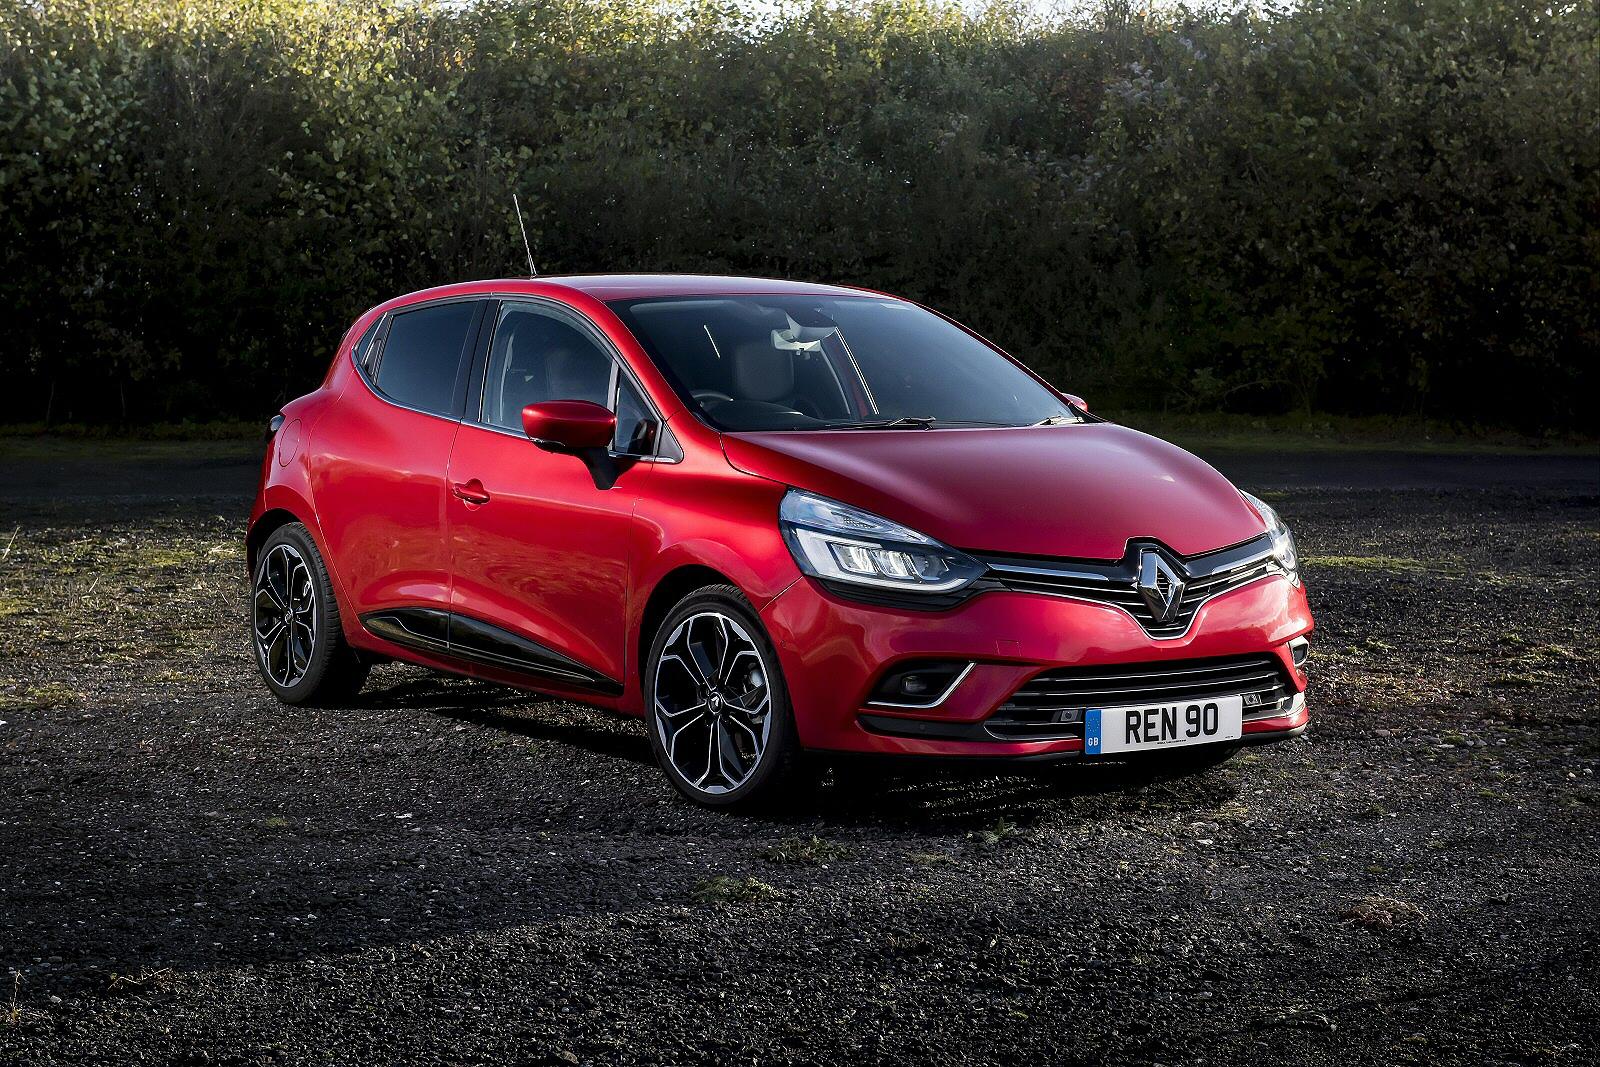 RenaultClio0518(3)